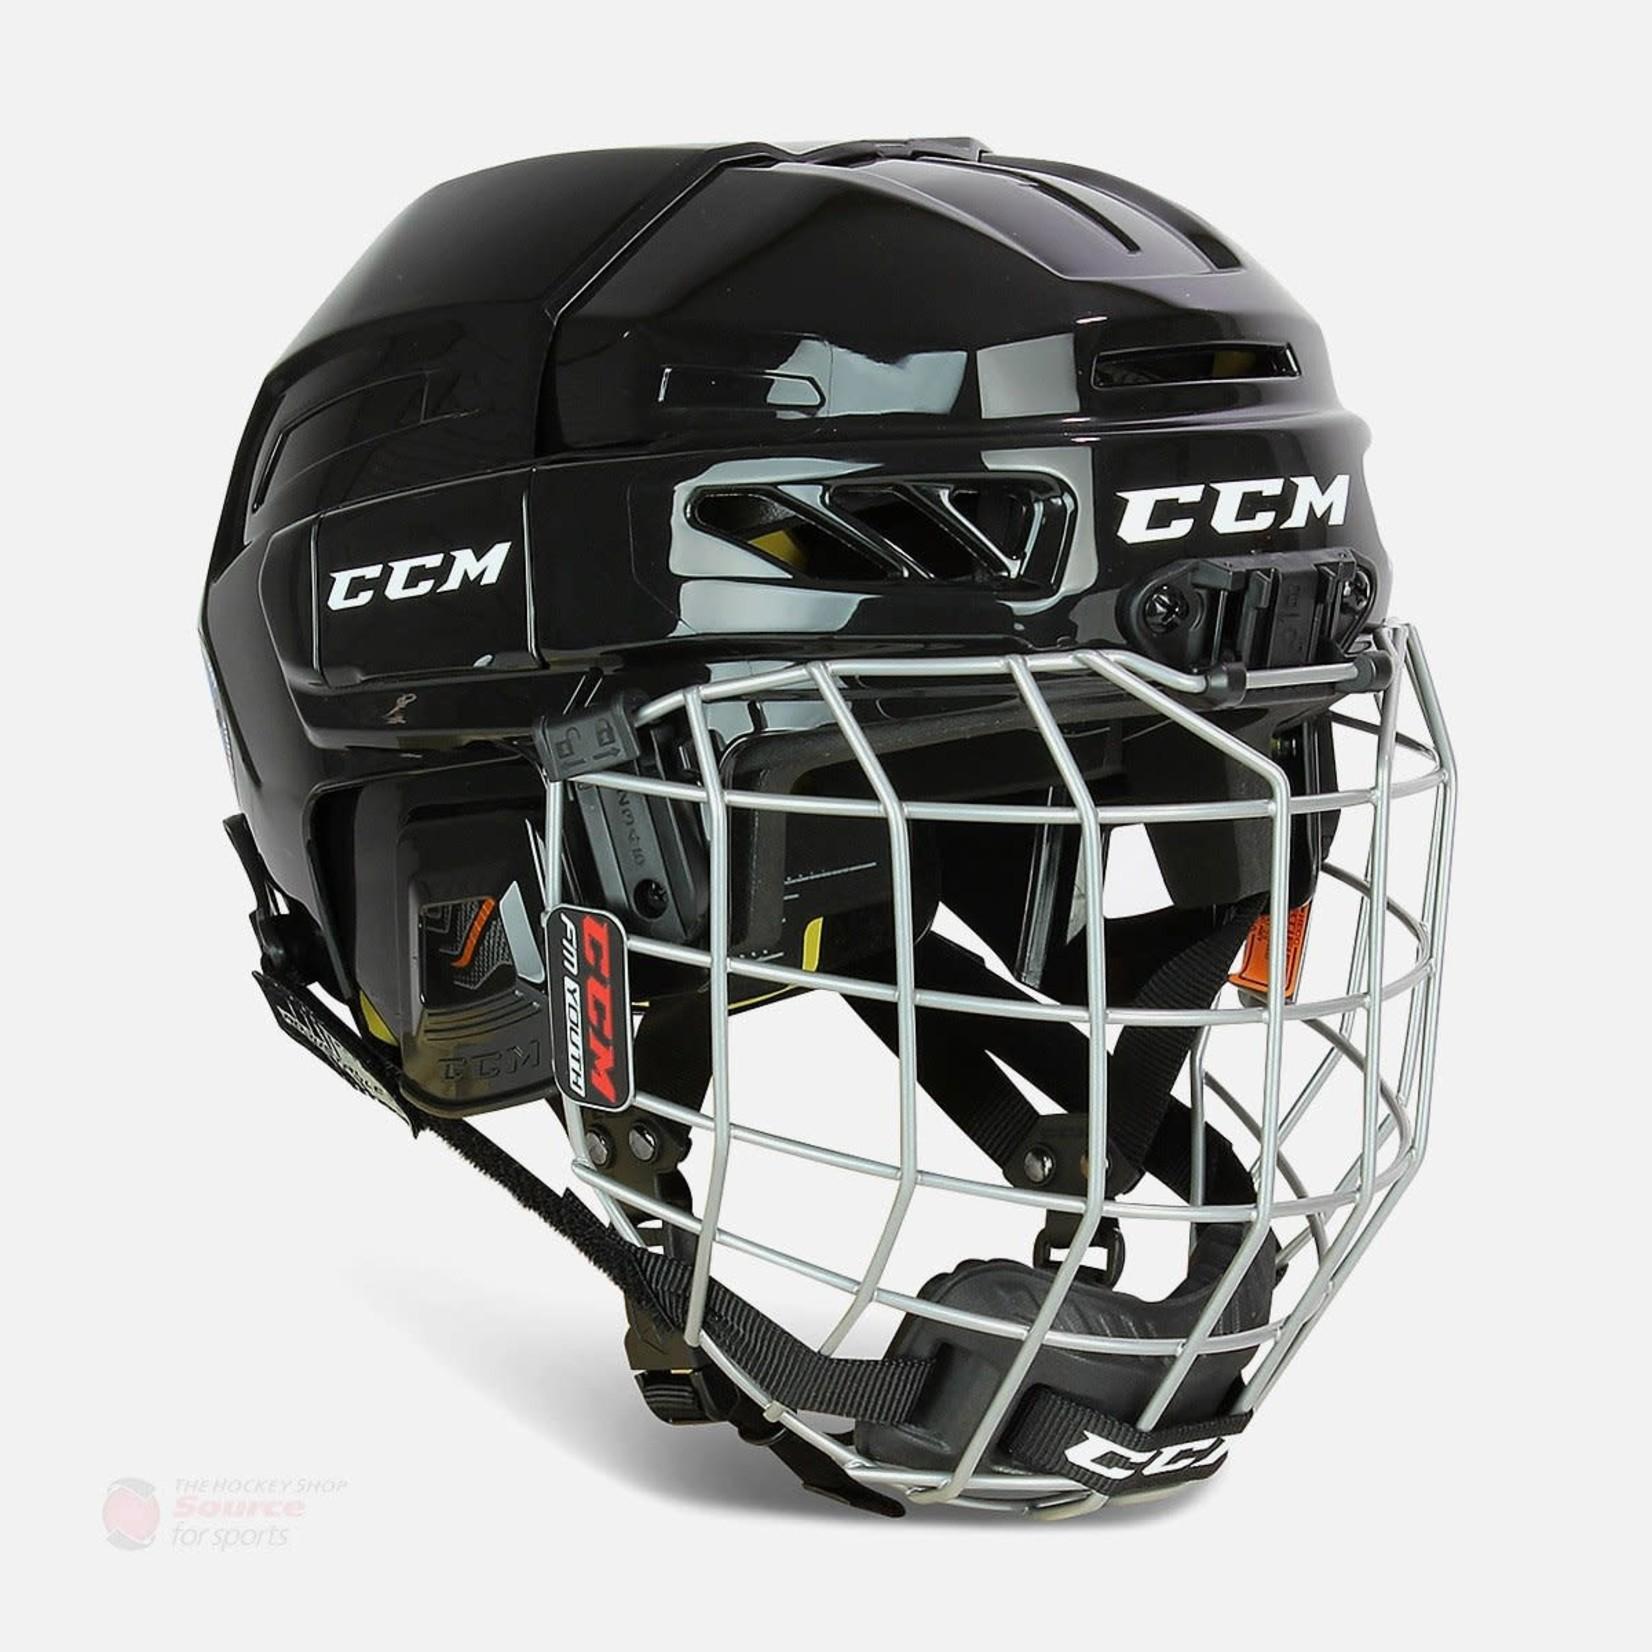 CCM CCM Hockey Helmet Combo, FL3DS, Youth